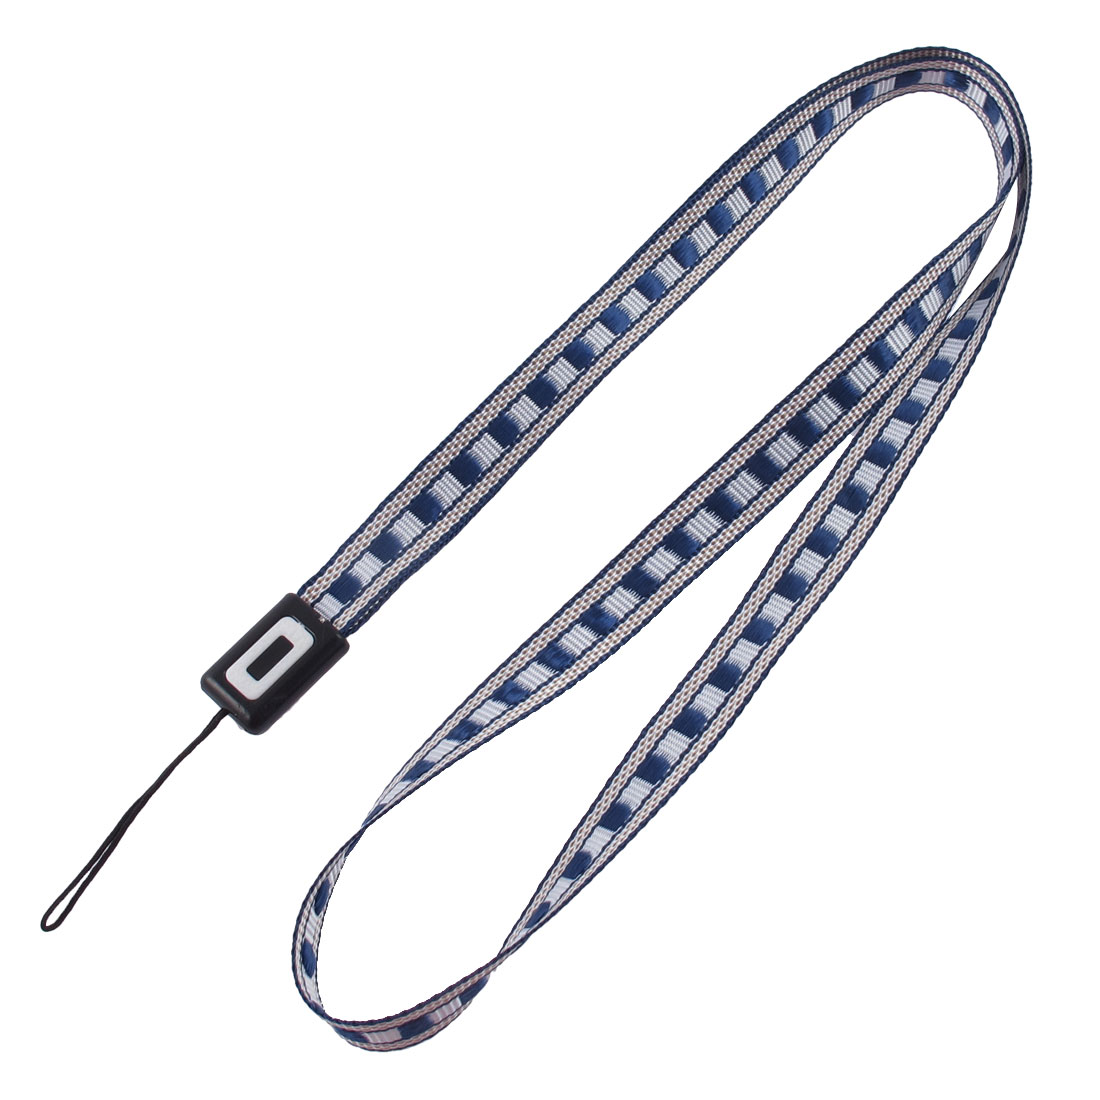 Fabric Plaid Pattern Cellphone MP4 Keyring String Strap Lanyard Deep Blue